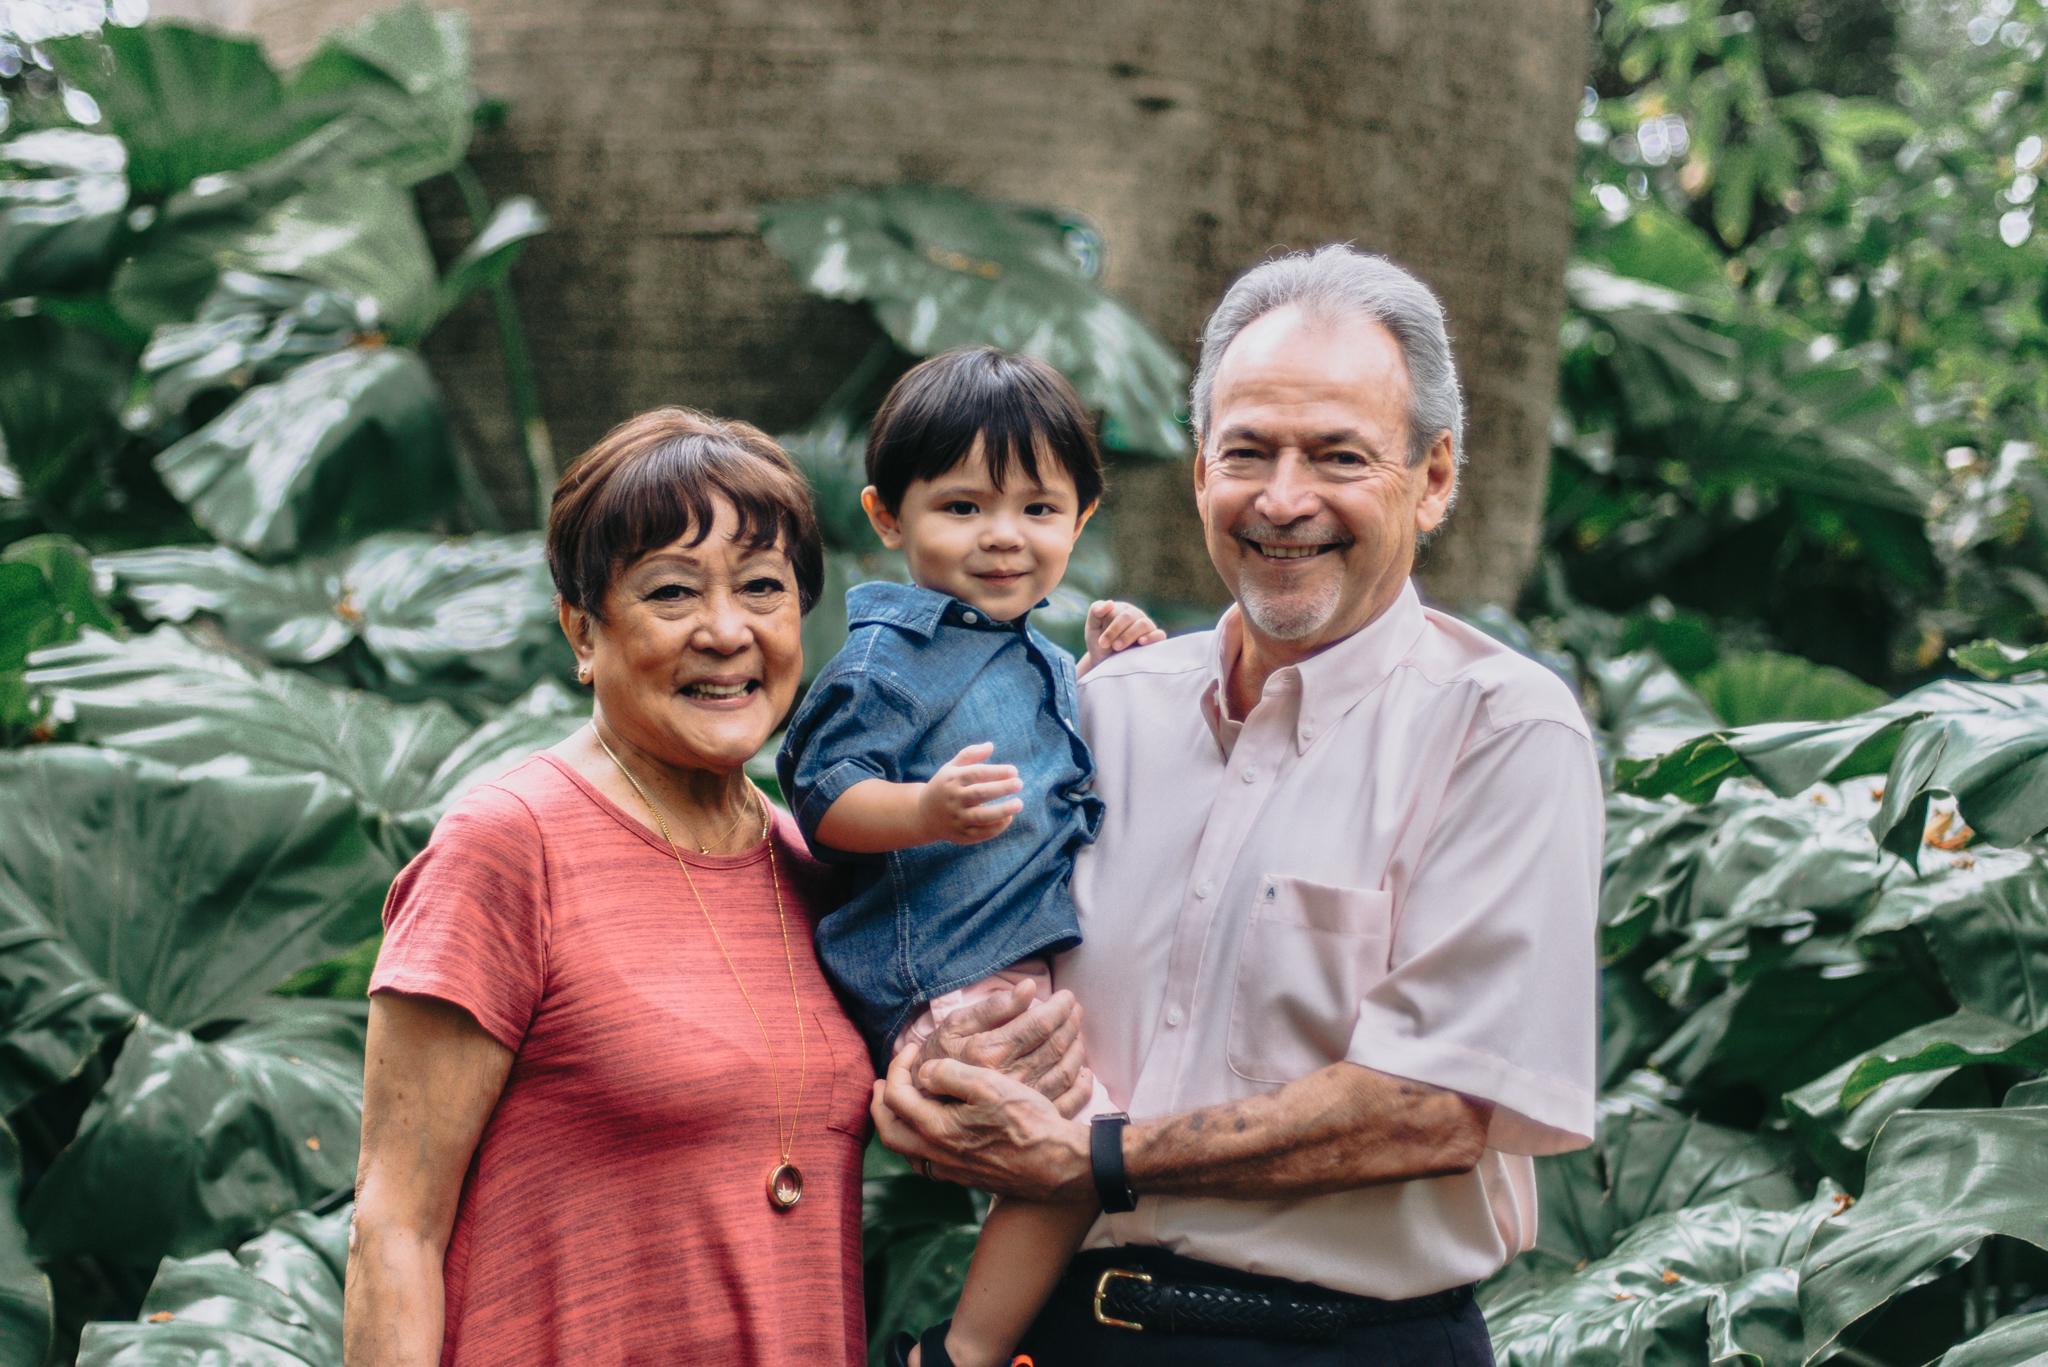 coen + family | botanical garden | oahu lifestyle photographer